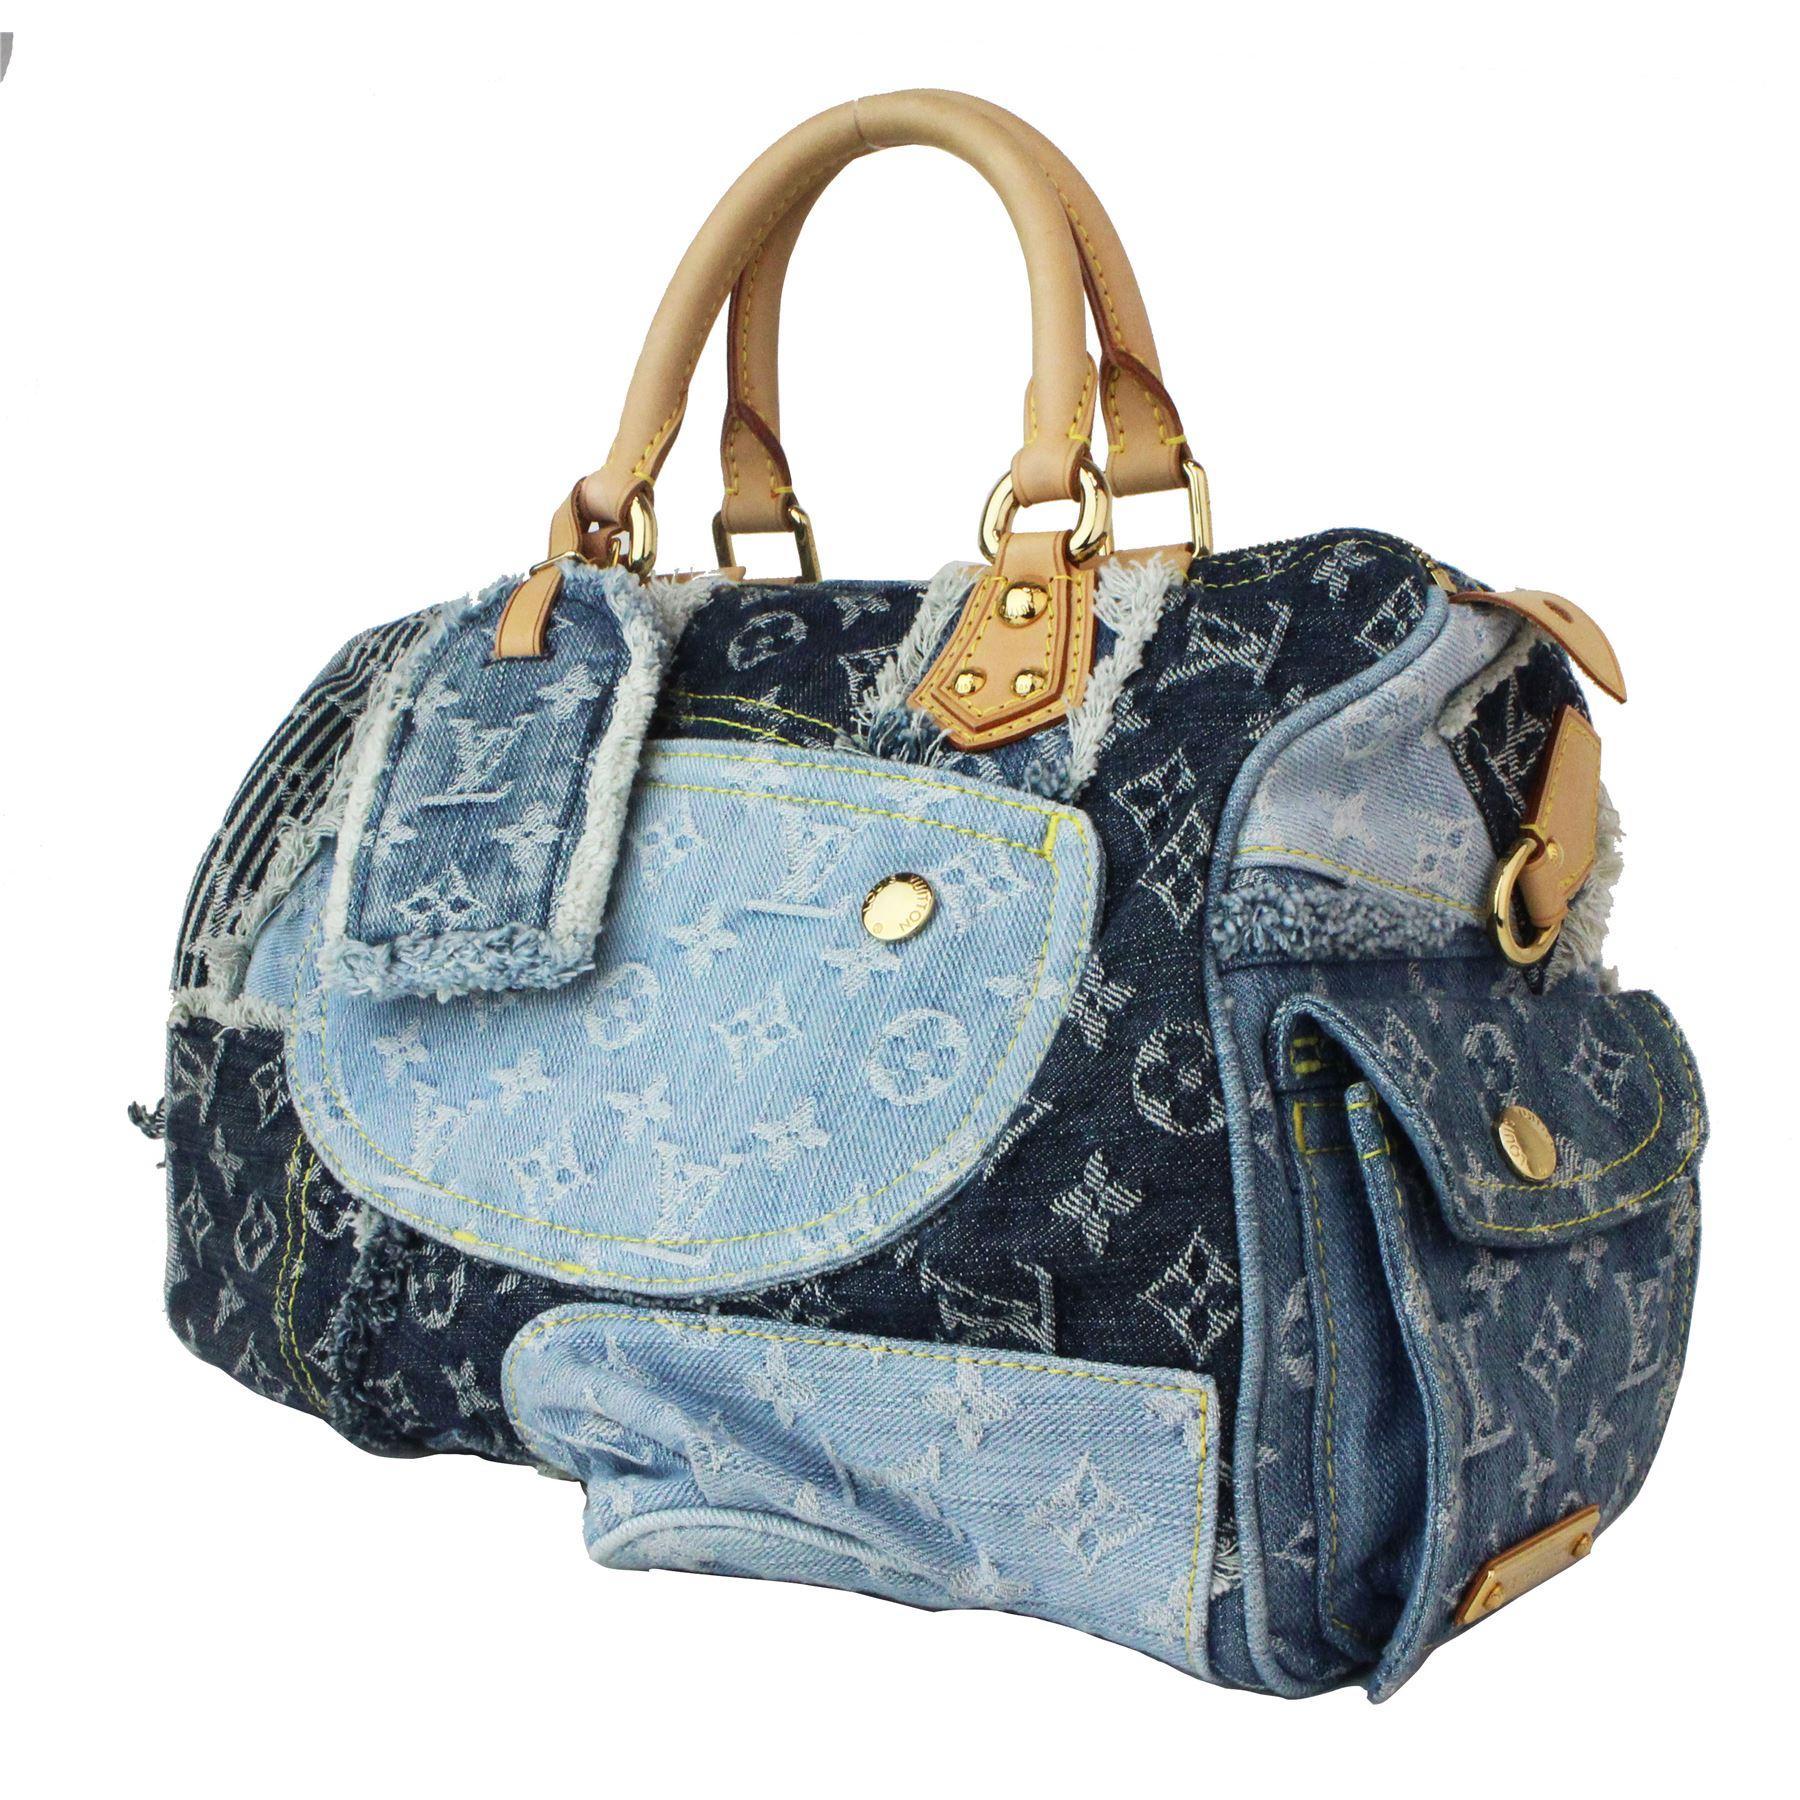 310284cdac19 ... Image 2   LOUIS VUITTON Limited Edition Speedy 30 Hand Bag Denim  Patchwork ...